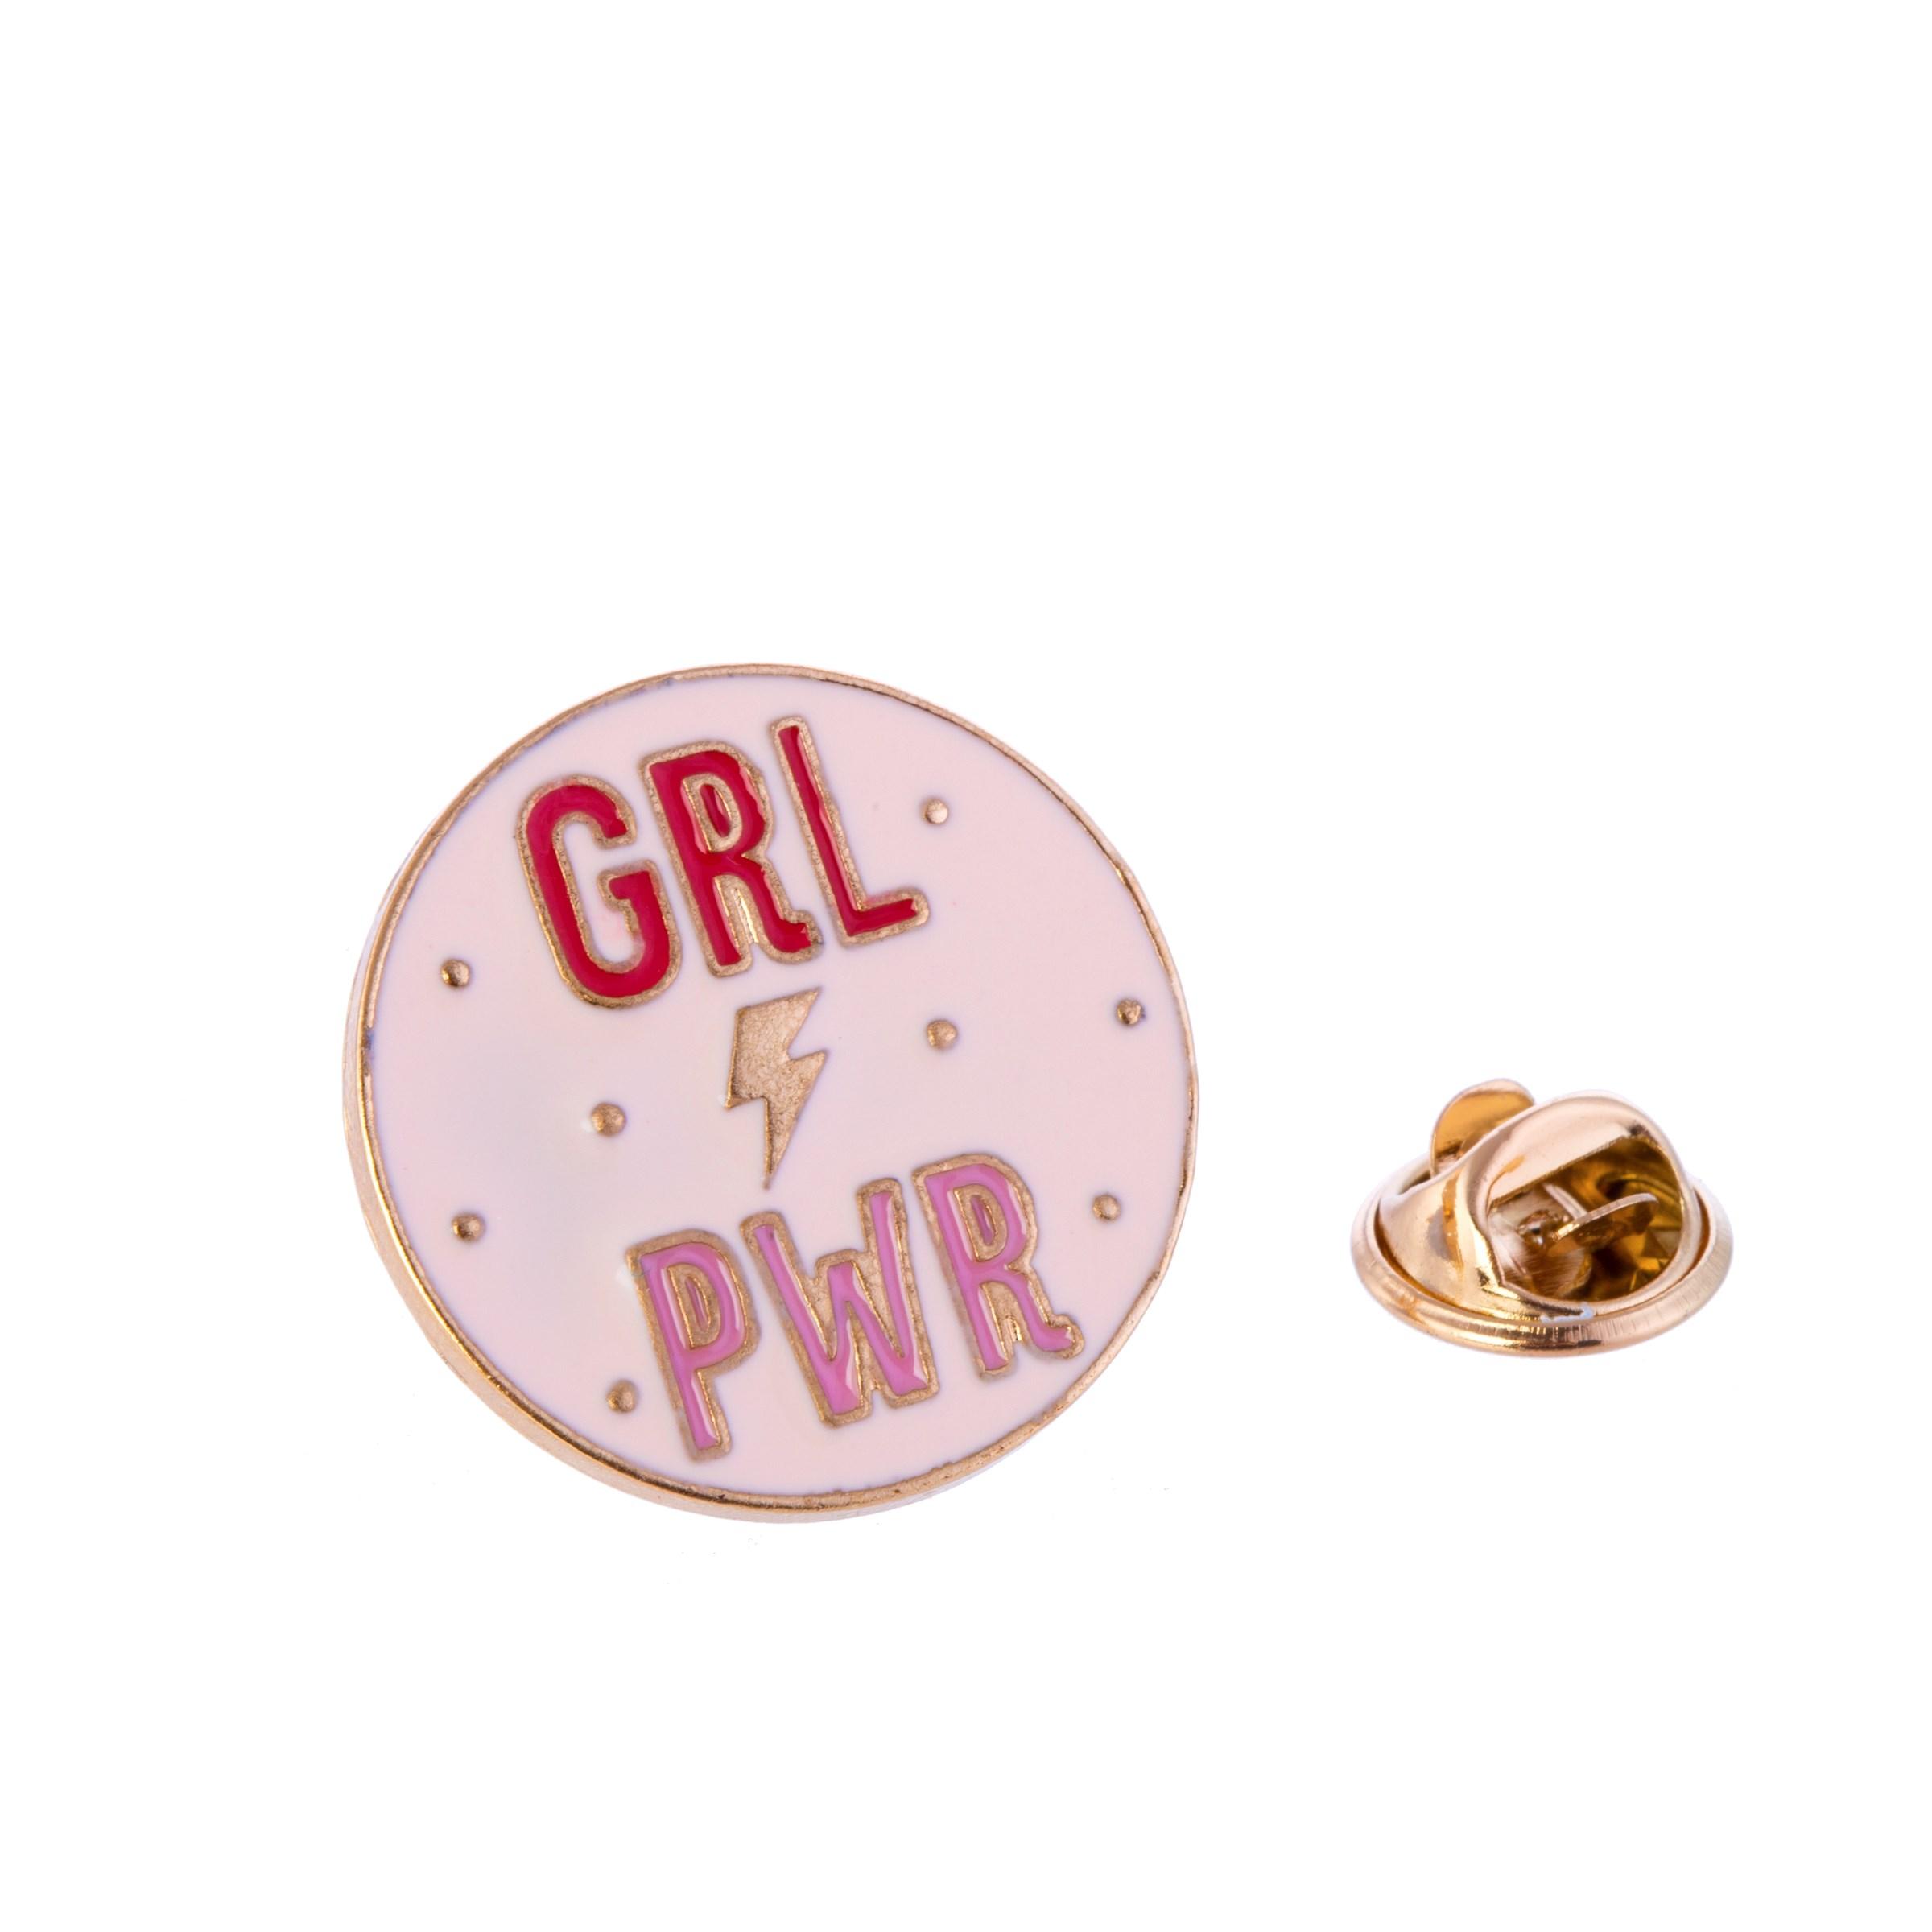 Girl Power Pin Badge